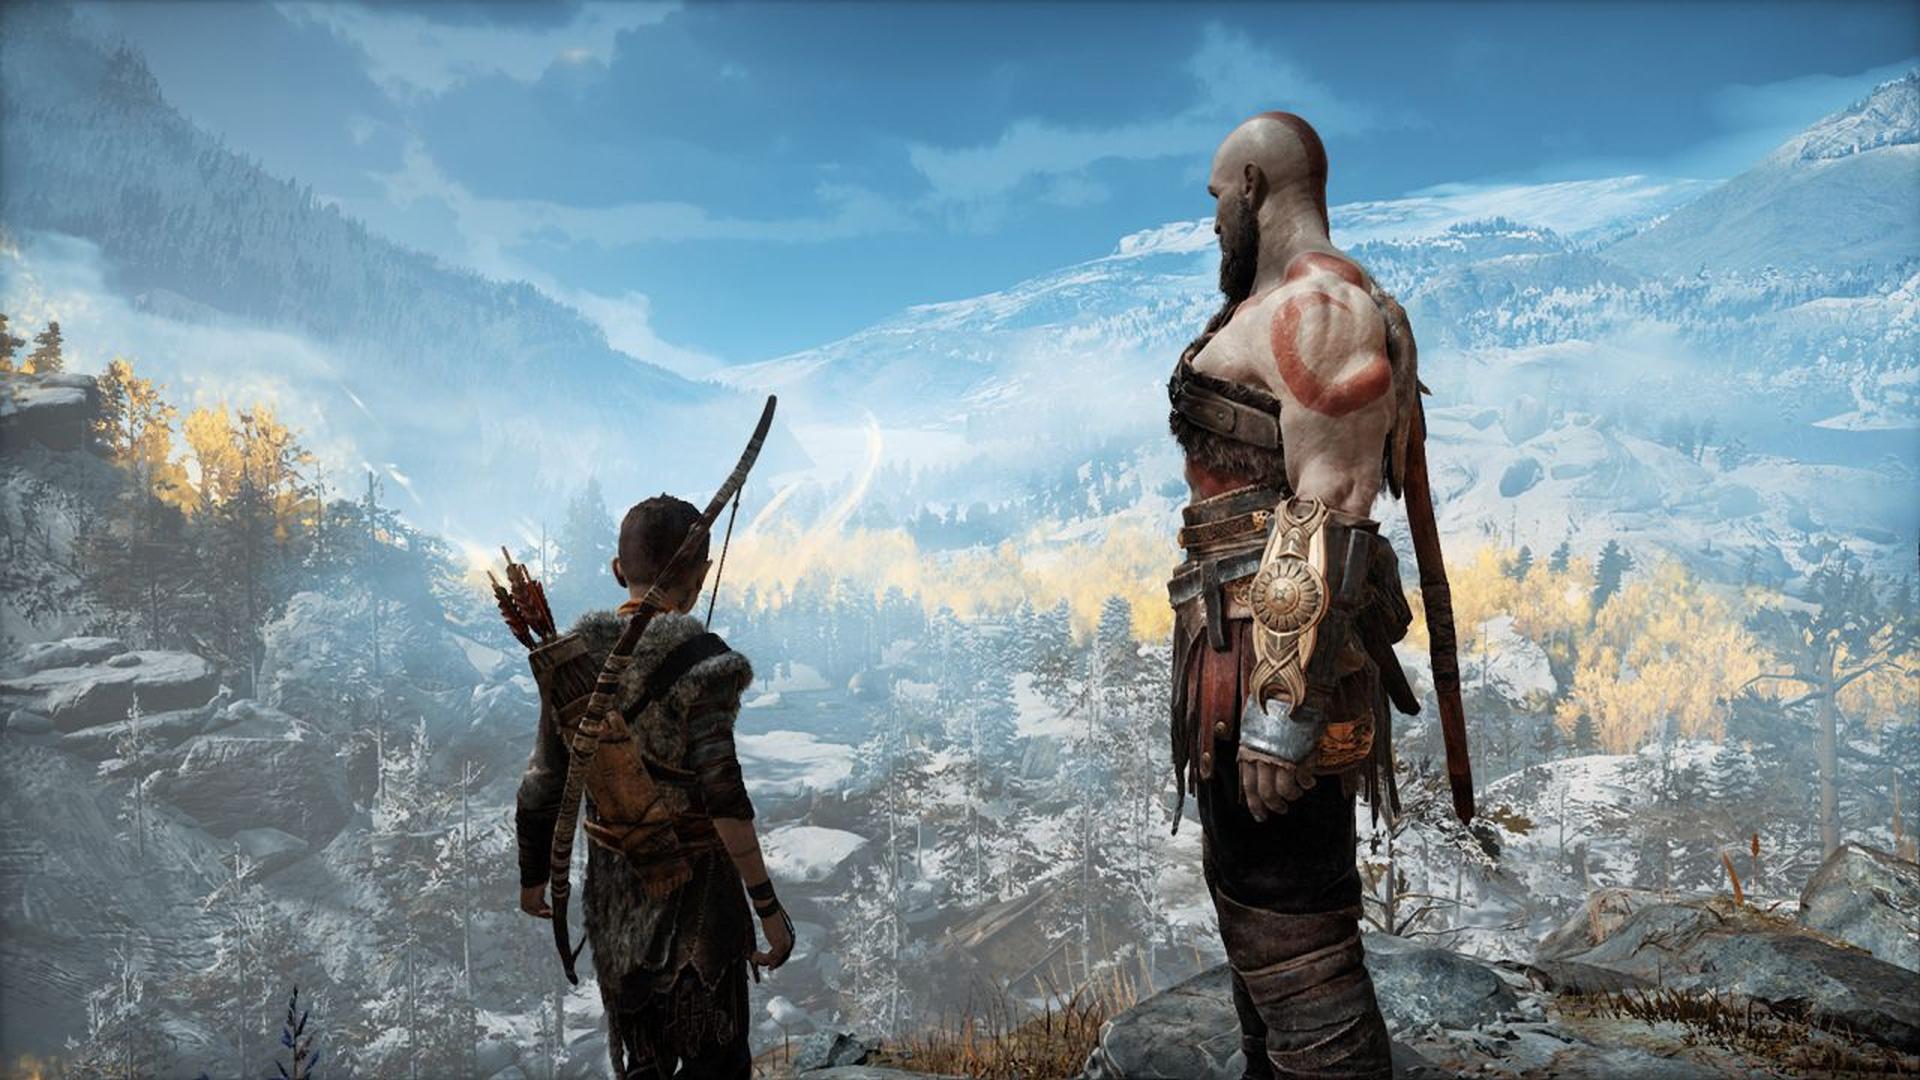 Is God of War Ragnarok coming to PS4? | GamesRadar+